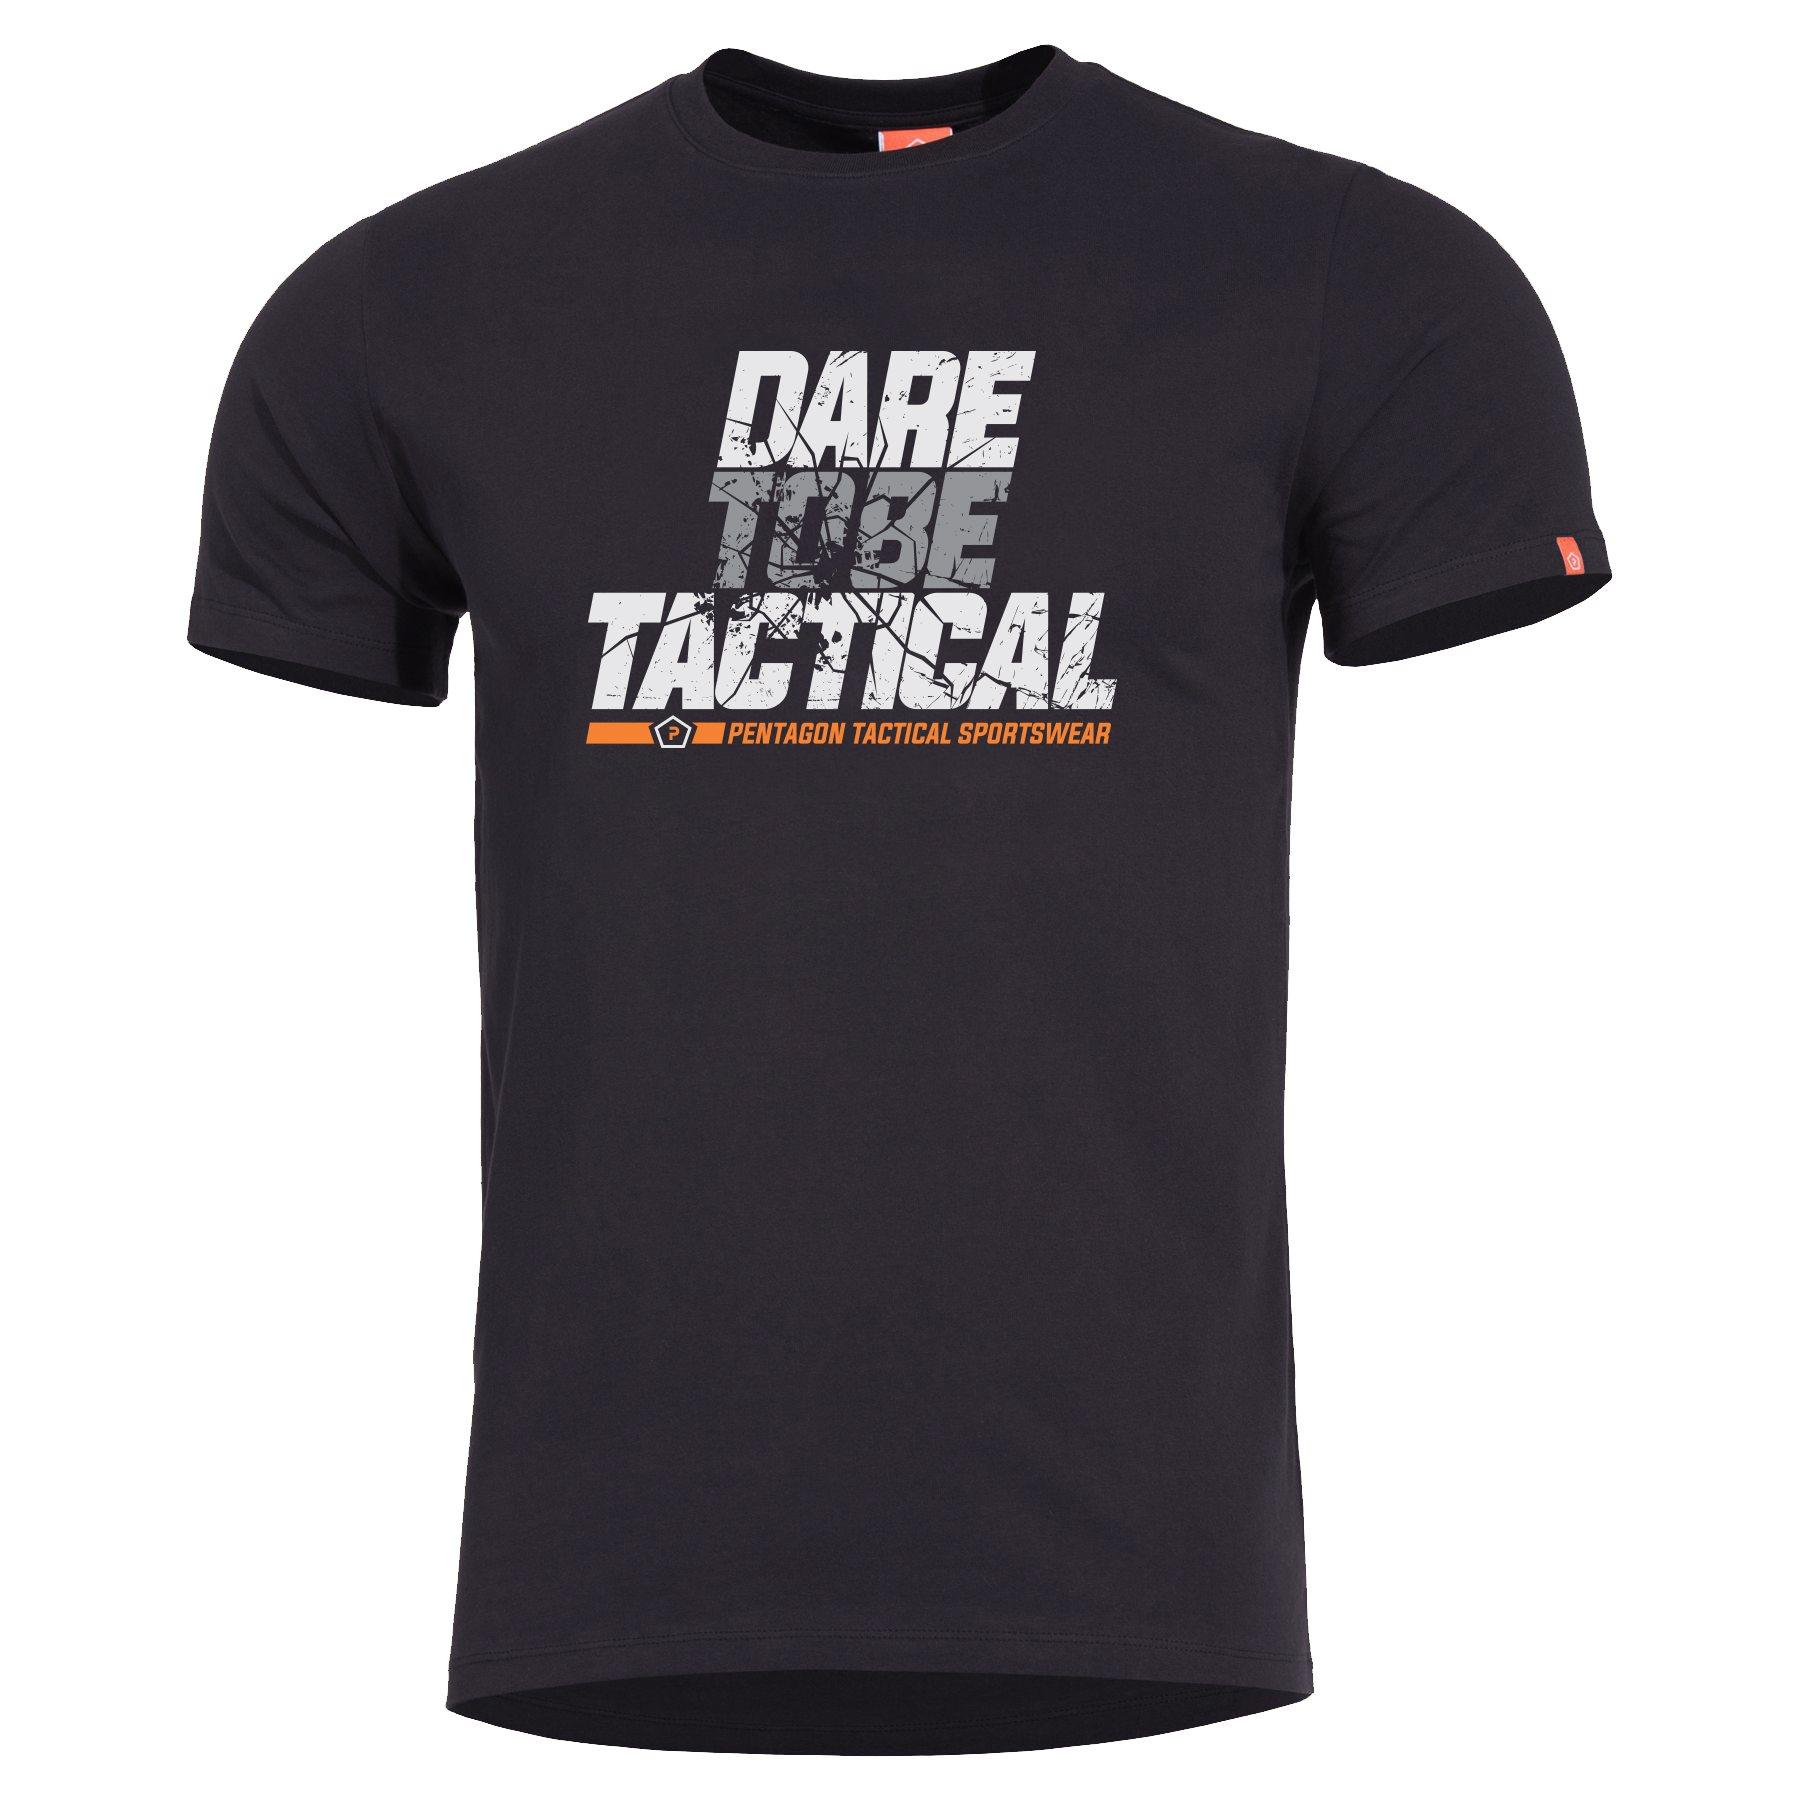 T-shirt DARE TO BE TACTICAL BLACK PENTAGON K09012-DT-01 L-11